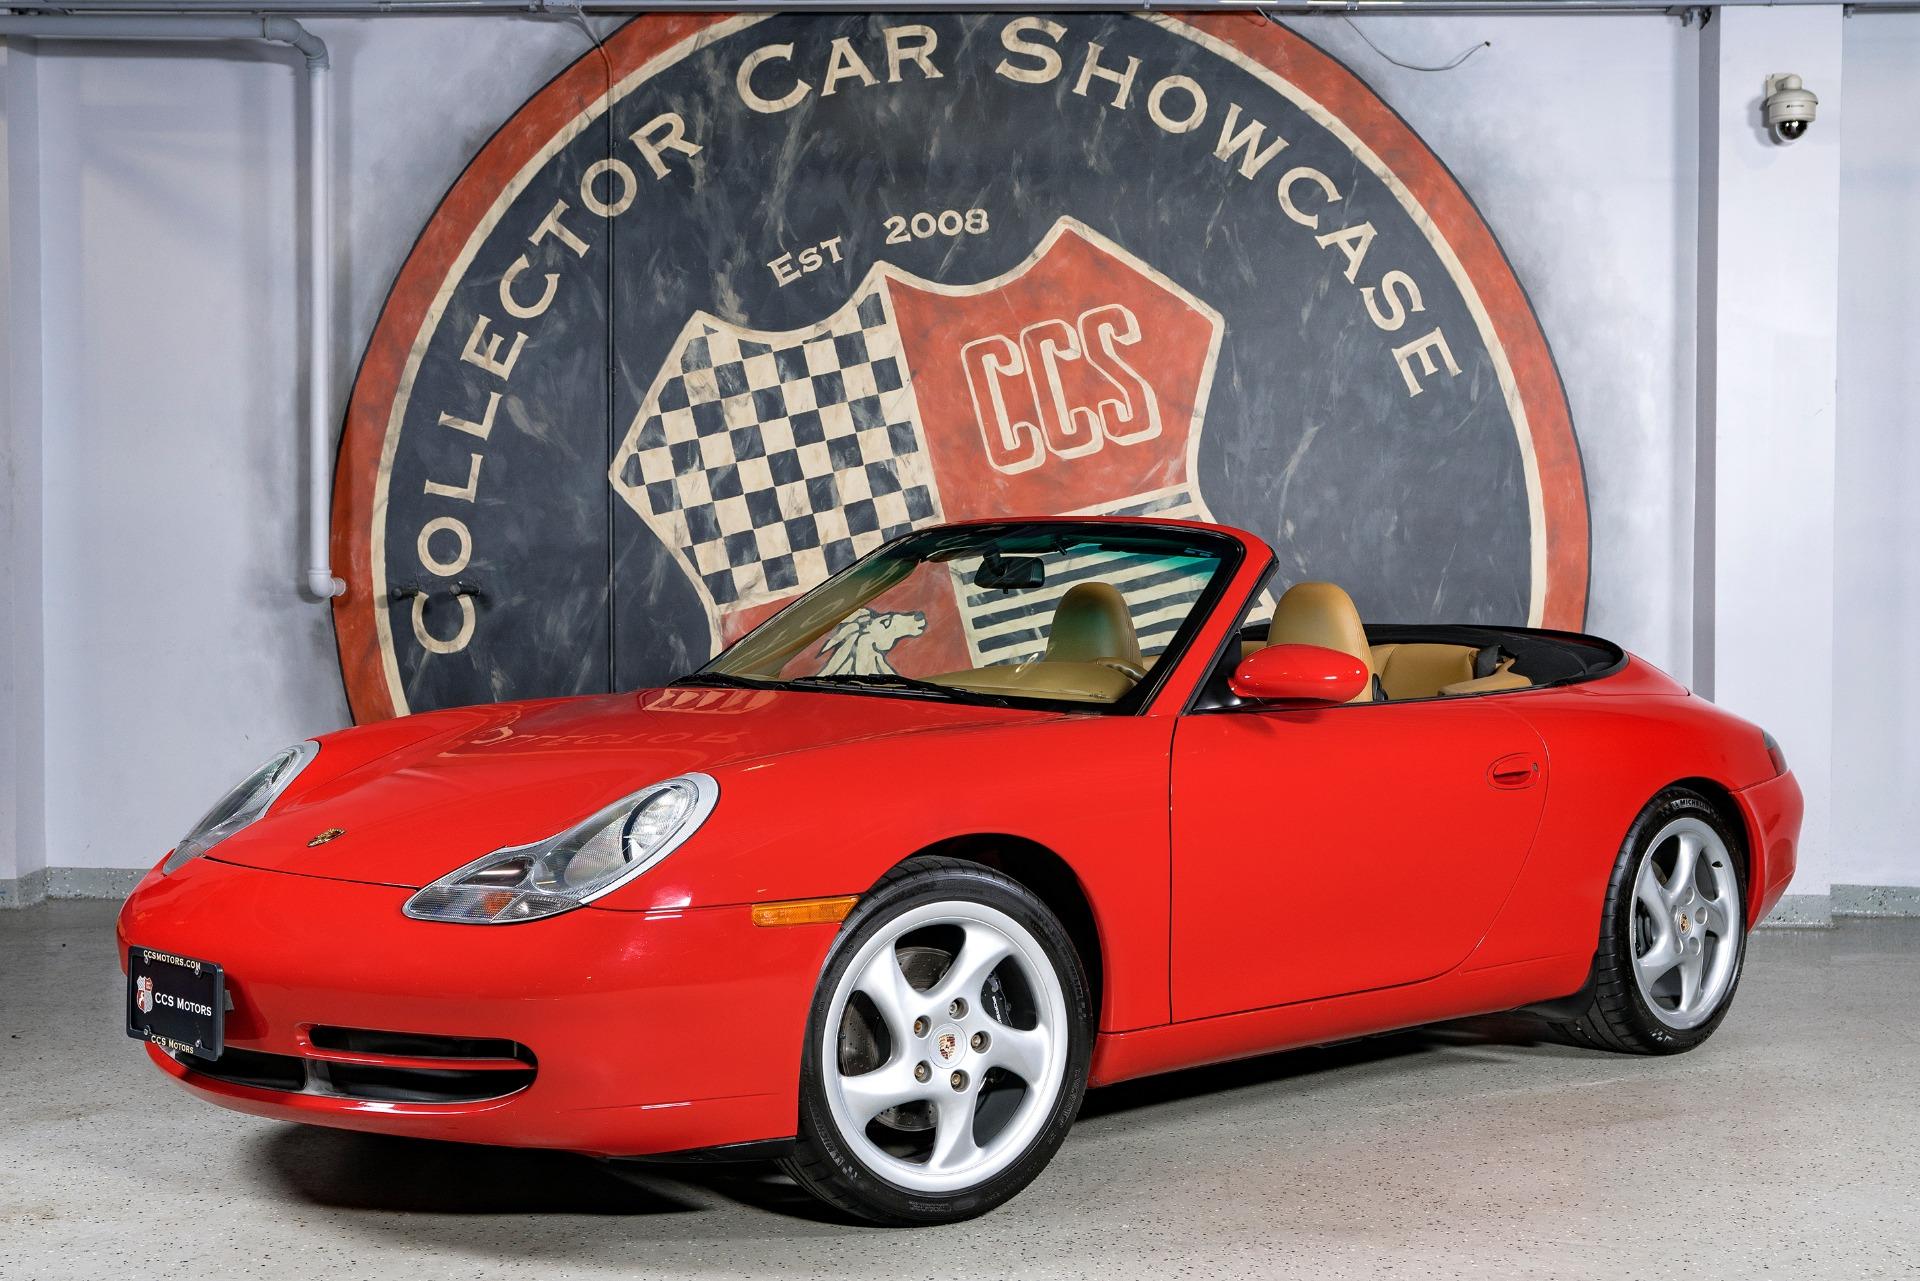 Used 2000 PORSCHE 911 Carrera Cabriolet | Oyster Bay, NY